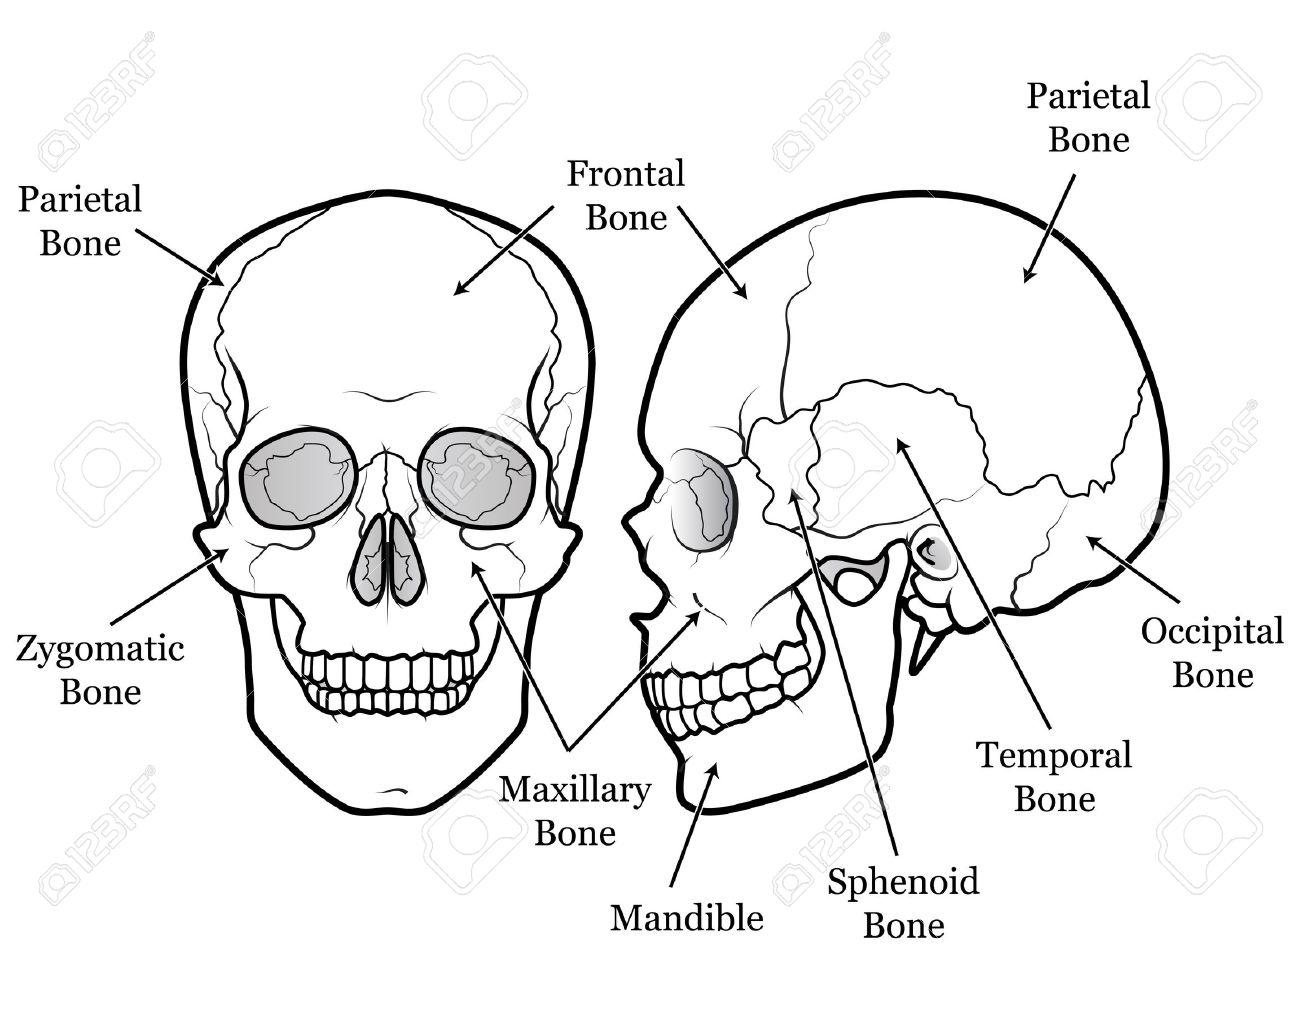 Human skull chart royalty free cliparts vectors and stock human skull chart stock vector 16019153 ccuart Gallery